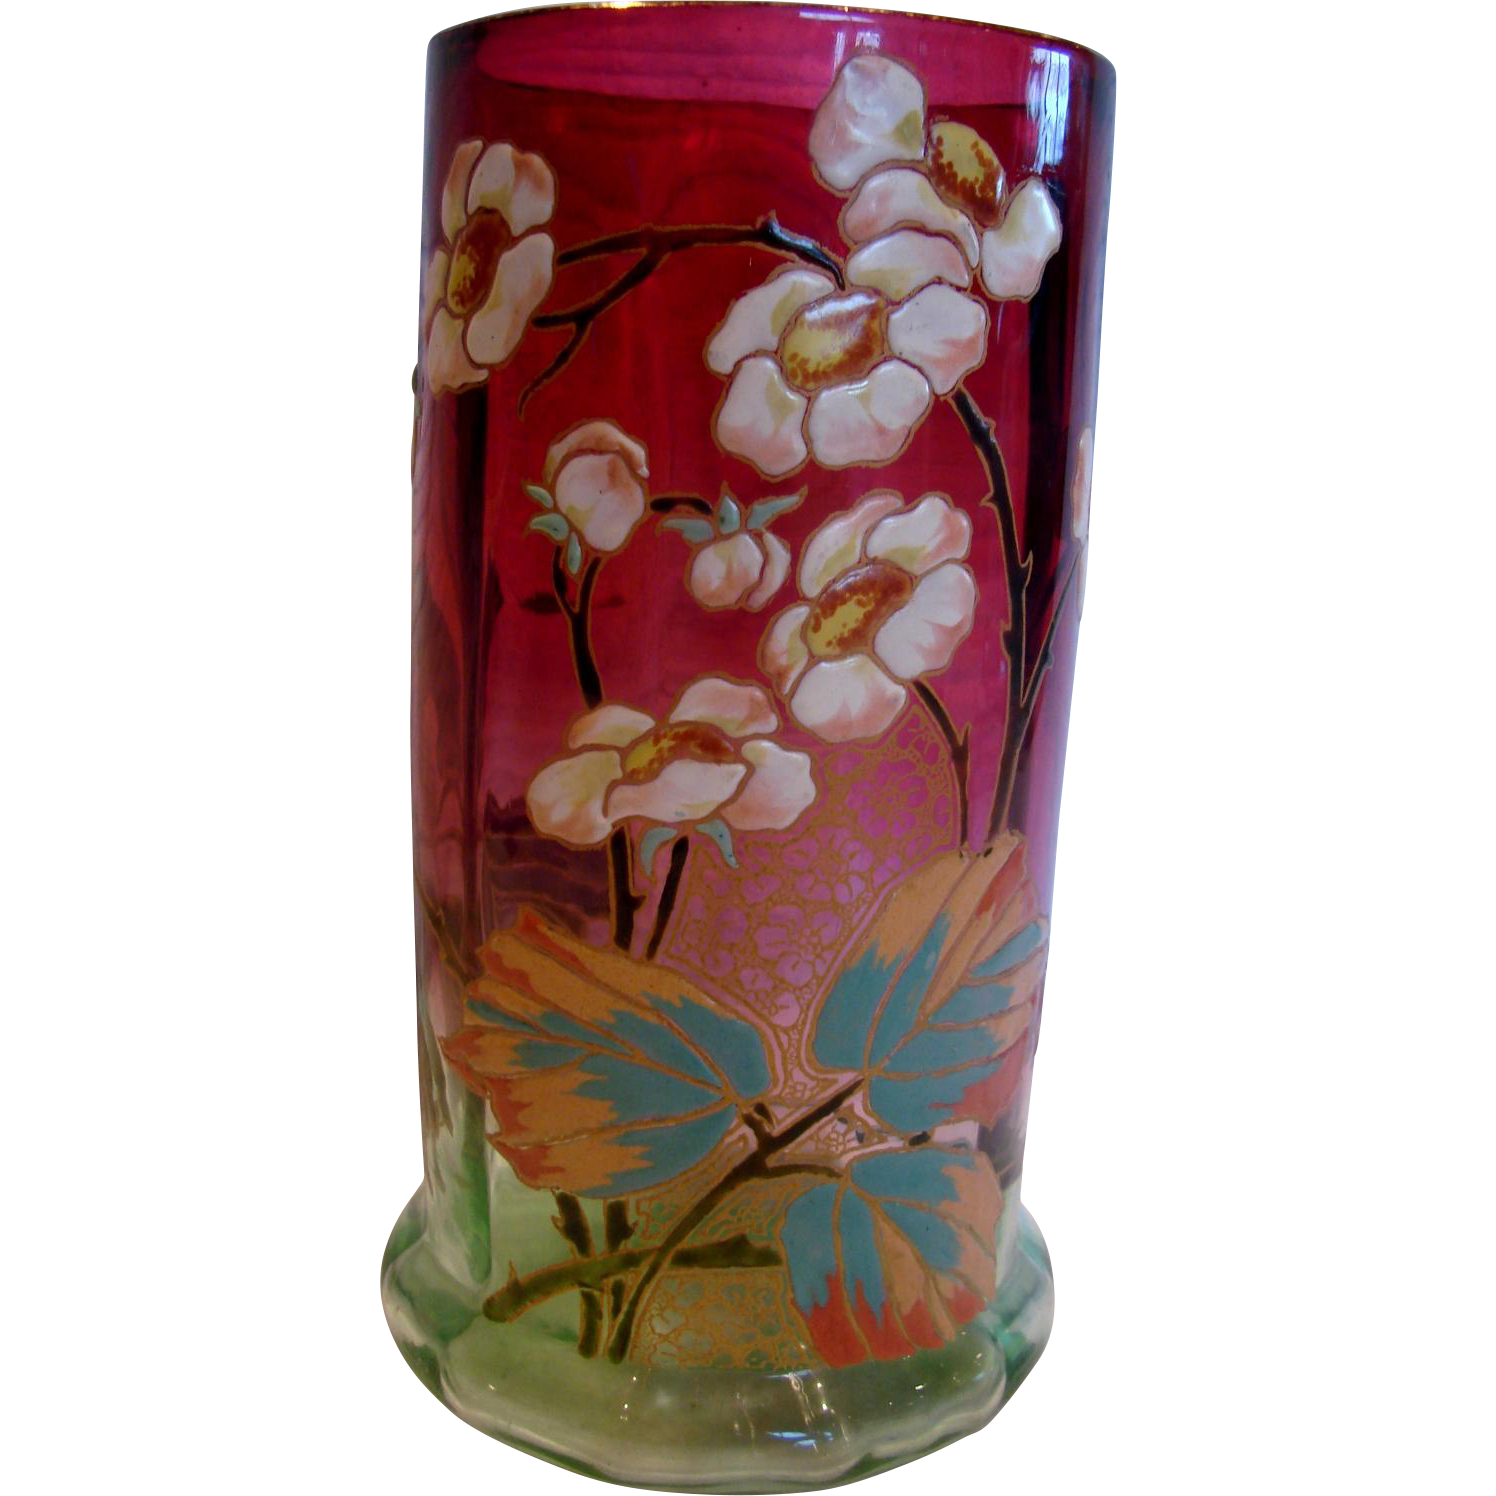 "French Legras Rubena (Rubina) Verde Art Glass 8"" Vase Paneled Hand Enameled Green-to-Red c 1885 - 1890"